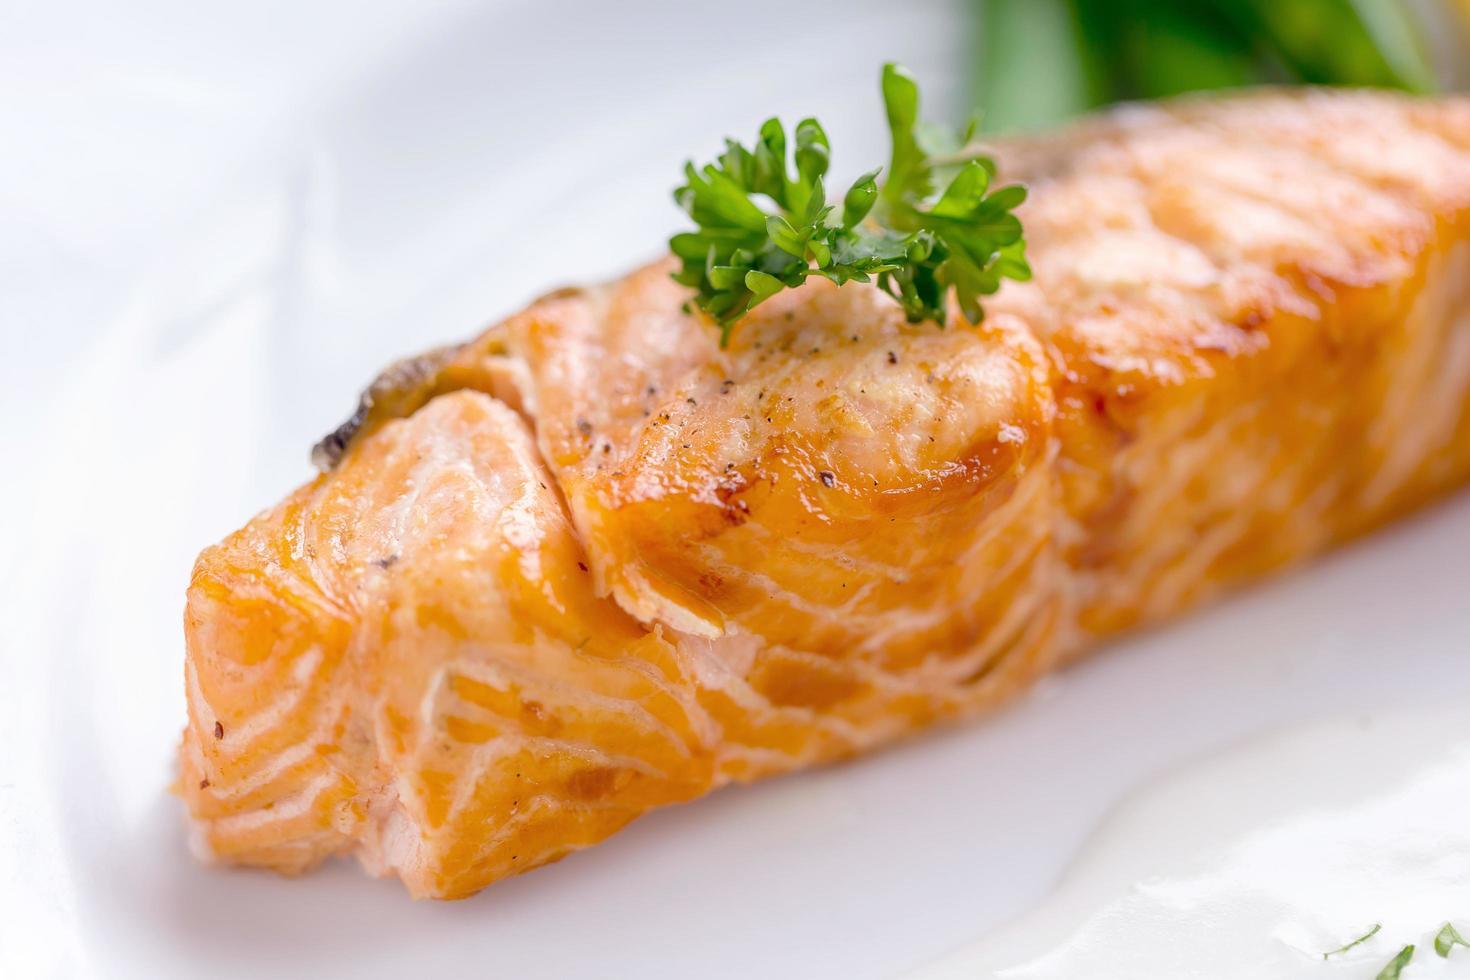 Filete de salmón con salsa blanca en un plato blanco foto